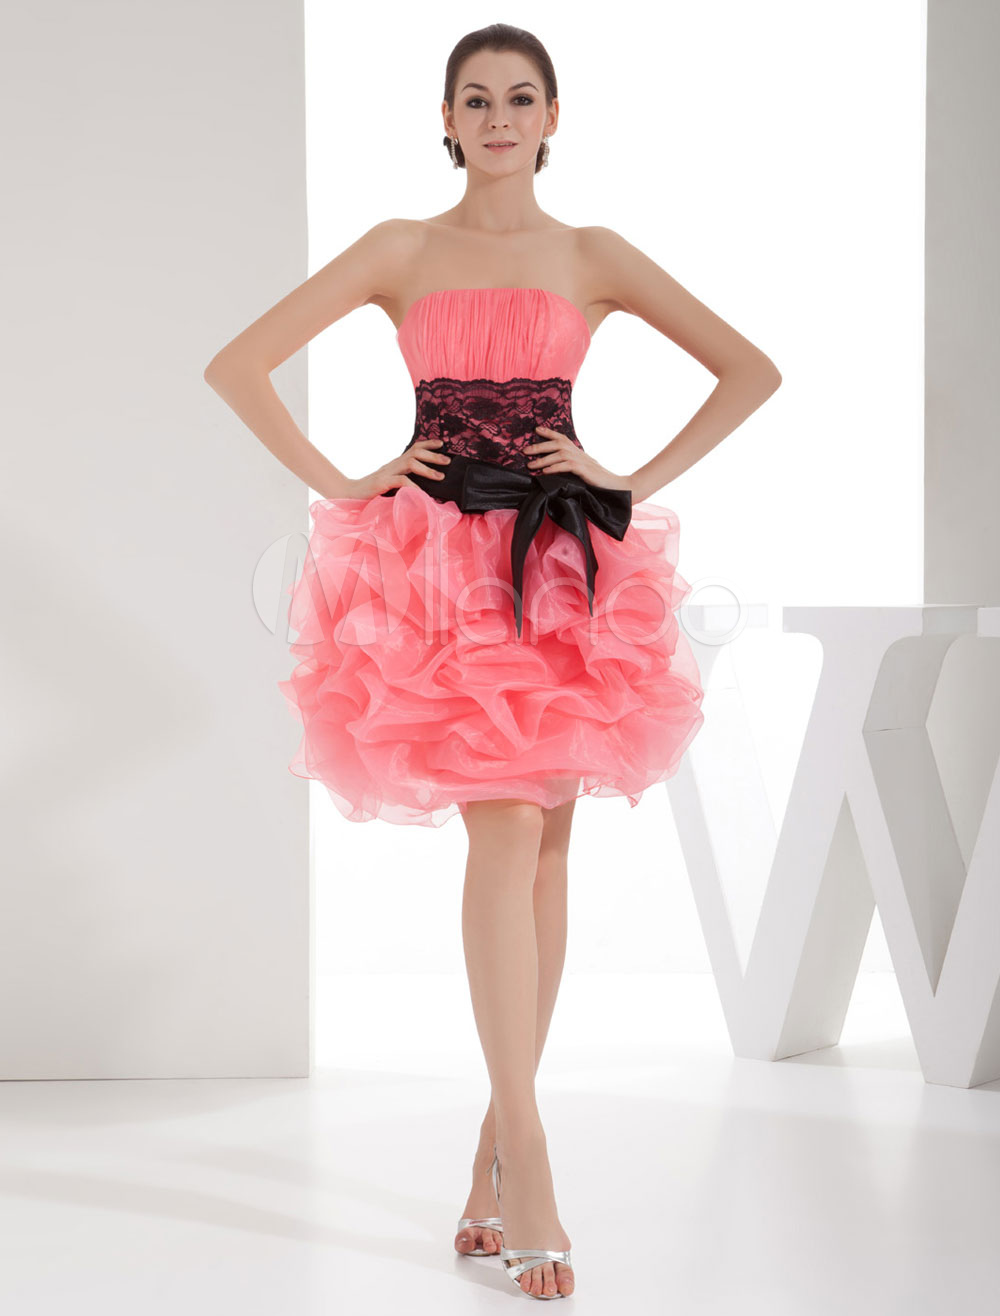 Strapless Homecoming Dress Lace Applique Belt Ruffles Organza Ball Gown Short Prom Dress Mini Cocktail Dress Milanoo